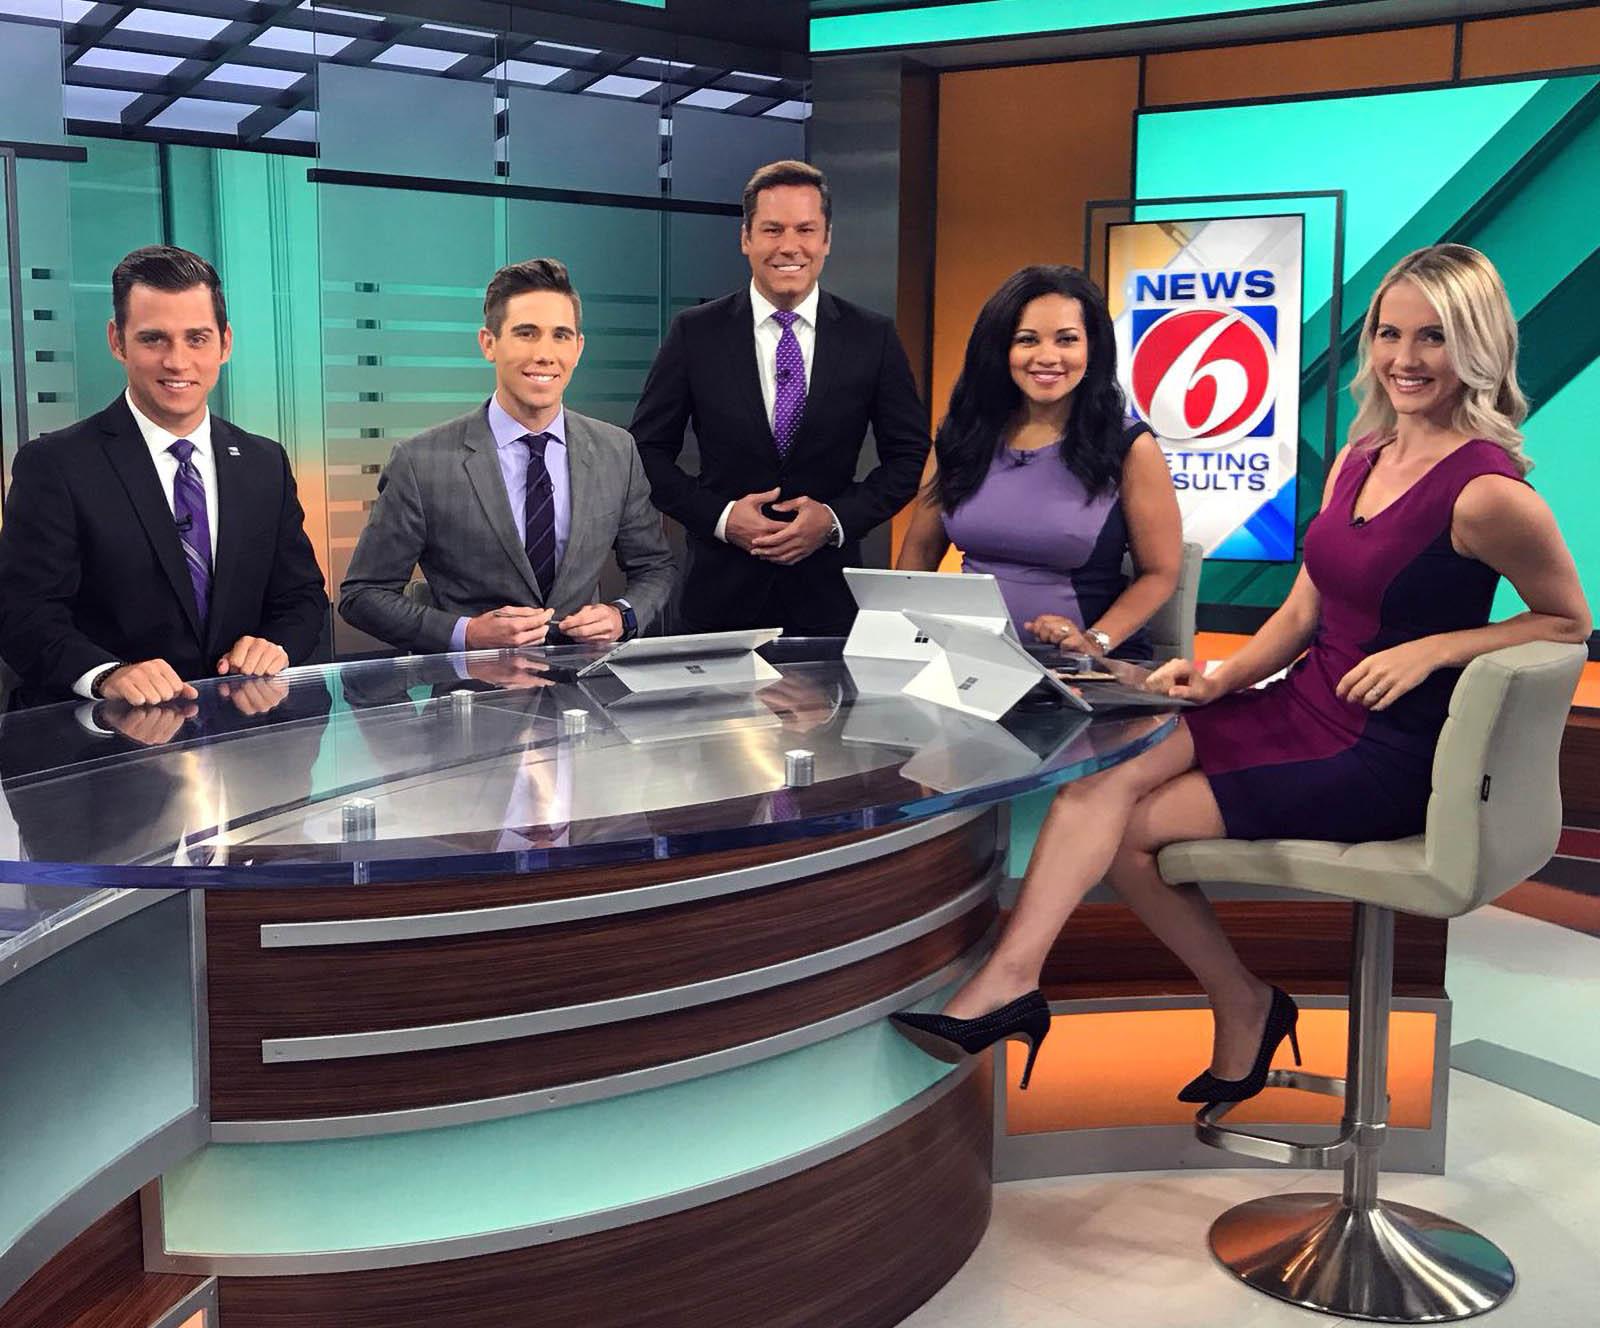 WKMG TV newscasters